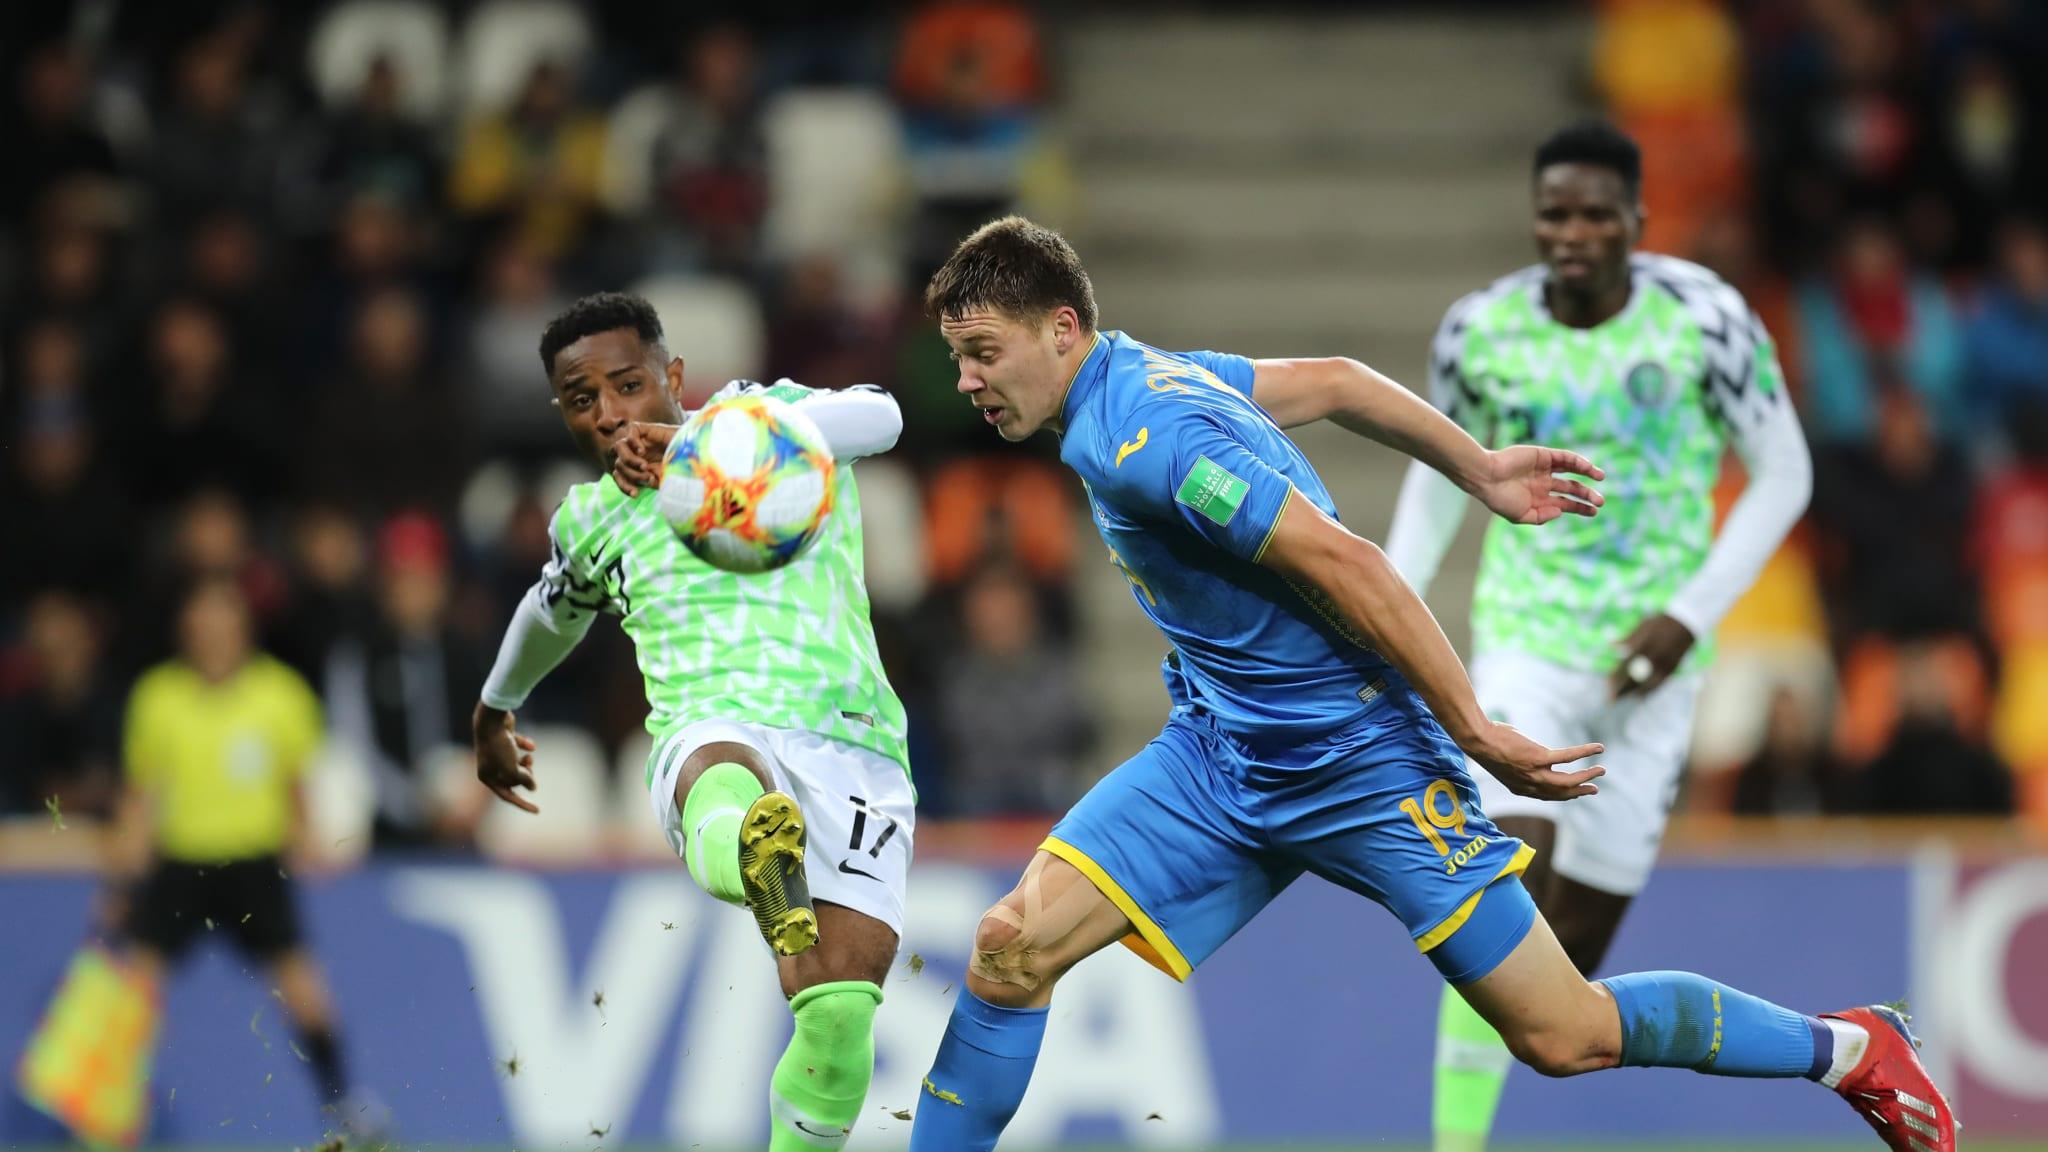 Makanjuola backs Flying Eagles for Gold at All African Games